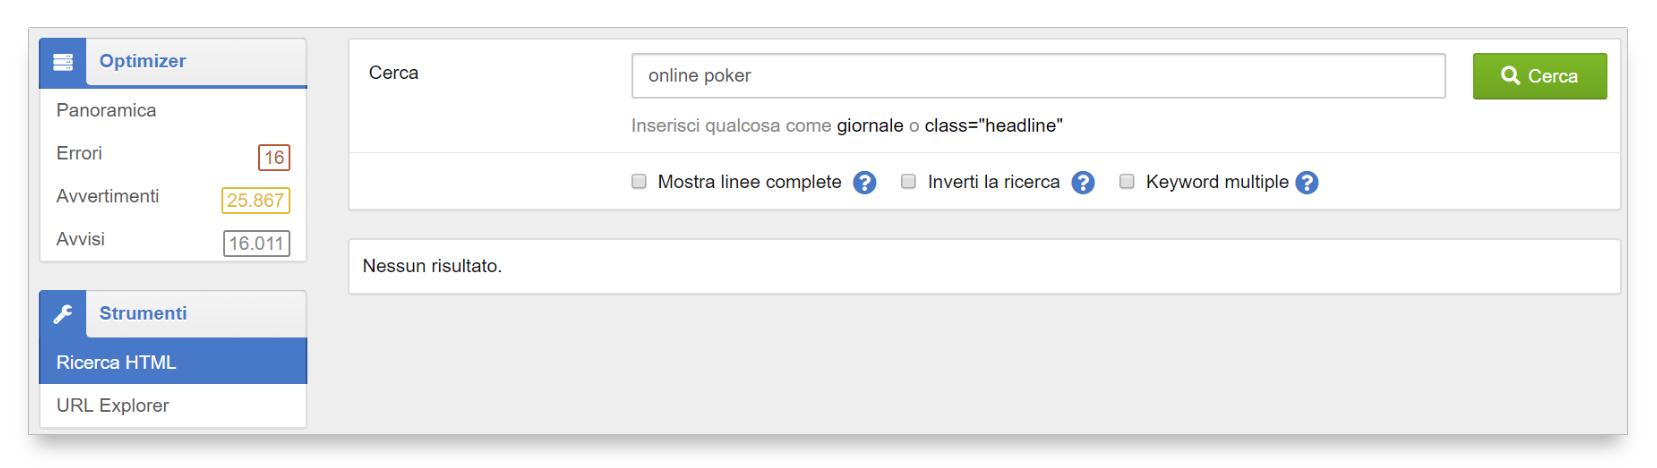 Ricerca html optimizer